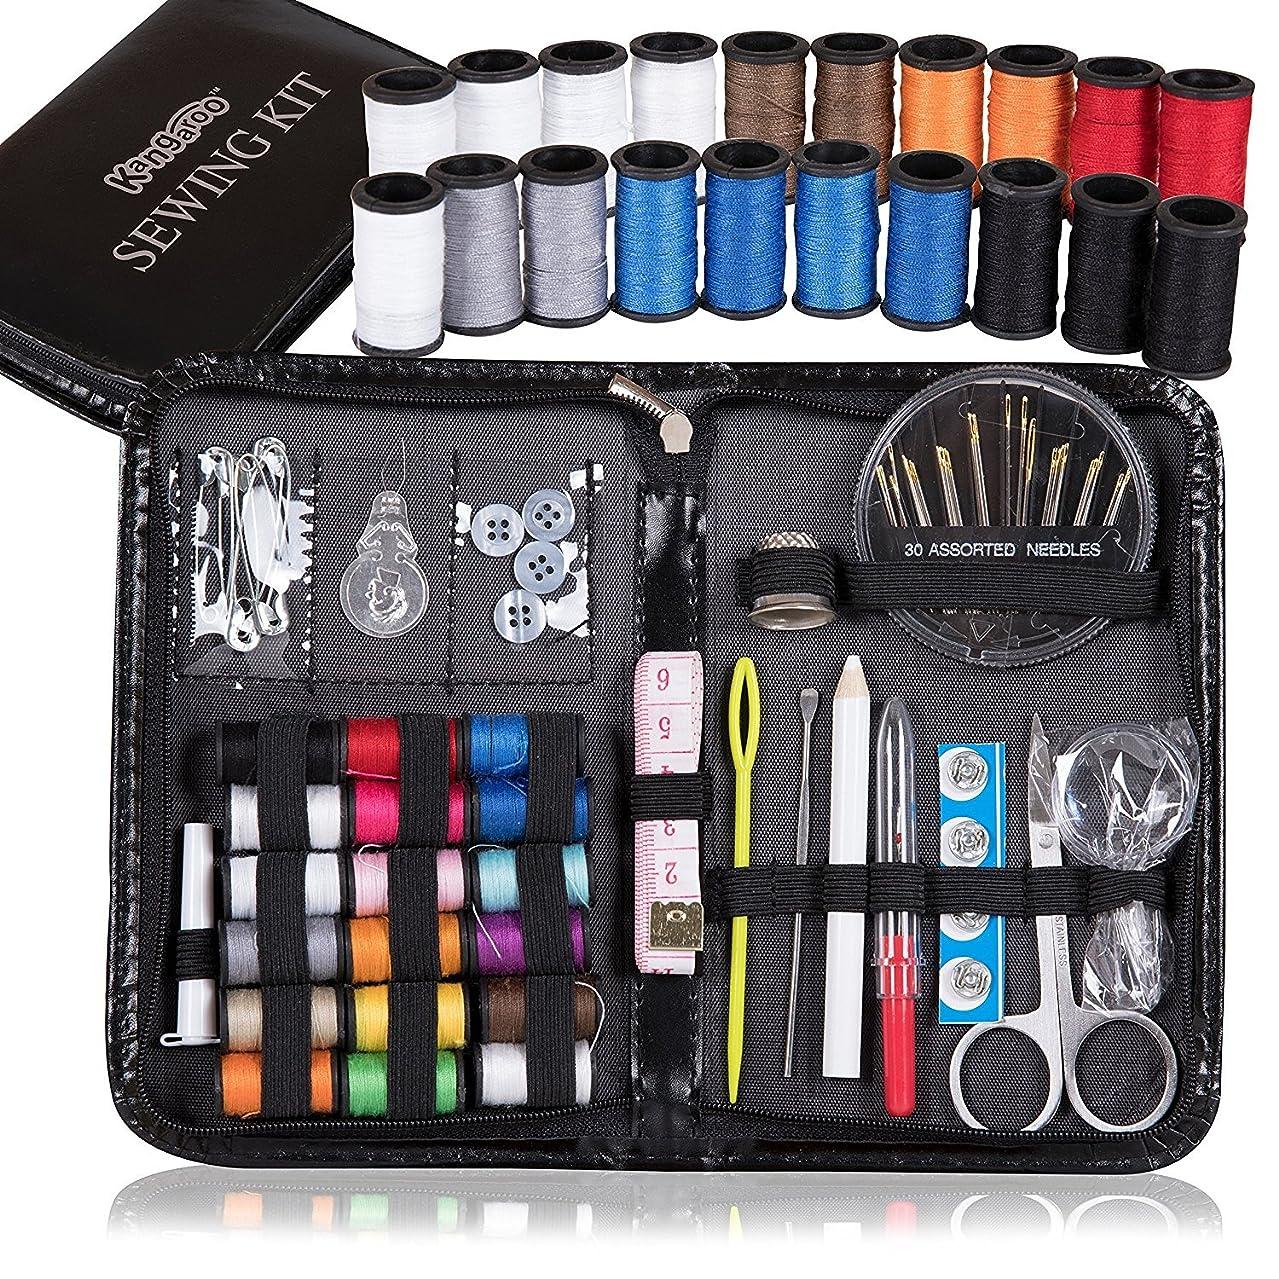 Kangaroo's Professional Sewing Kit - Over 95 Items; Travel Sewing Kit